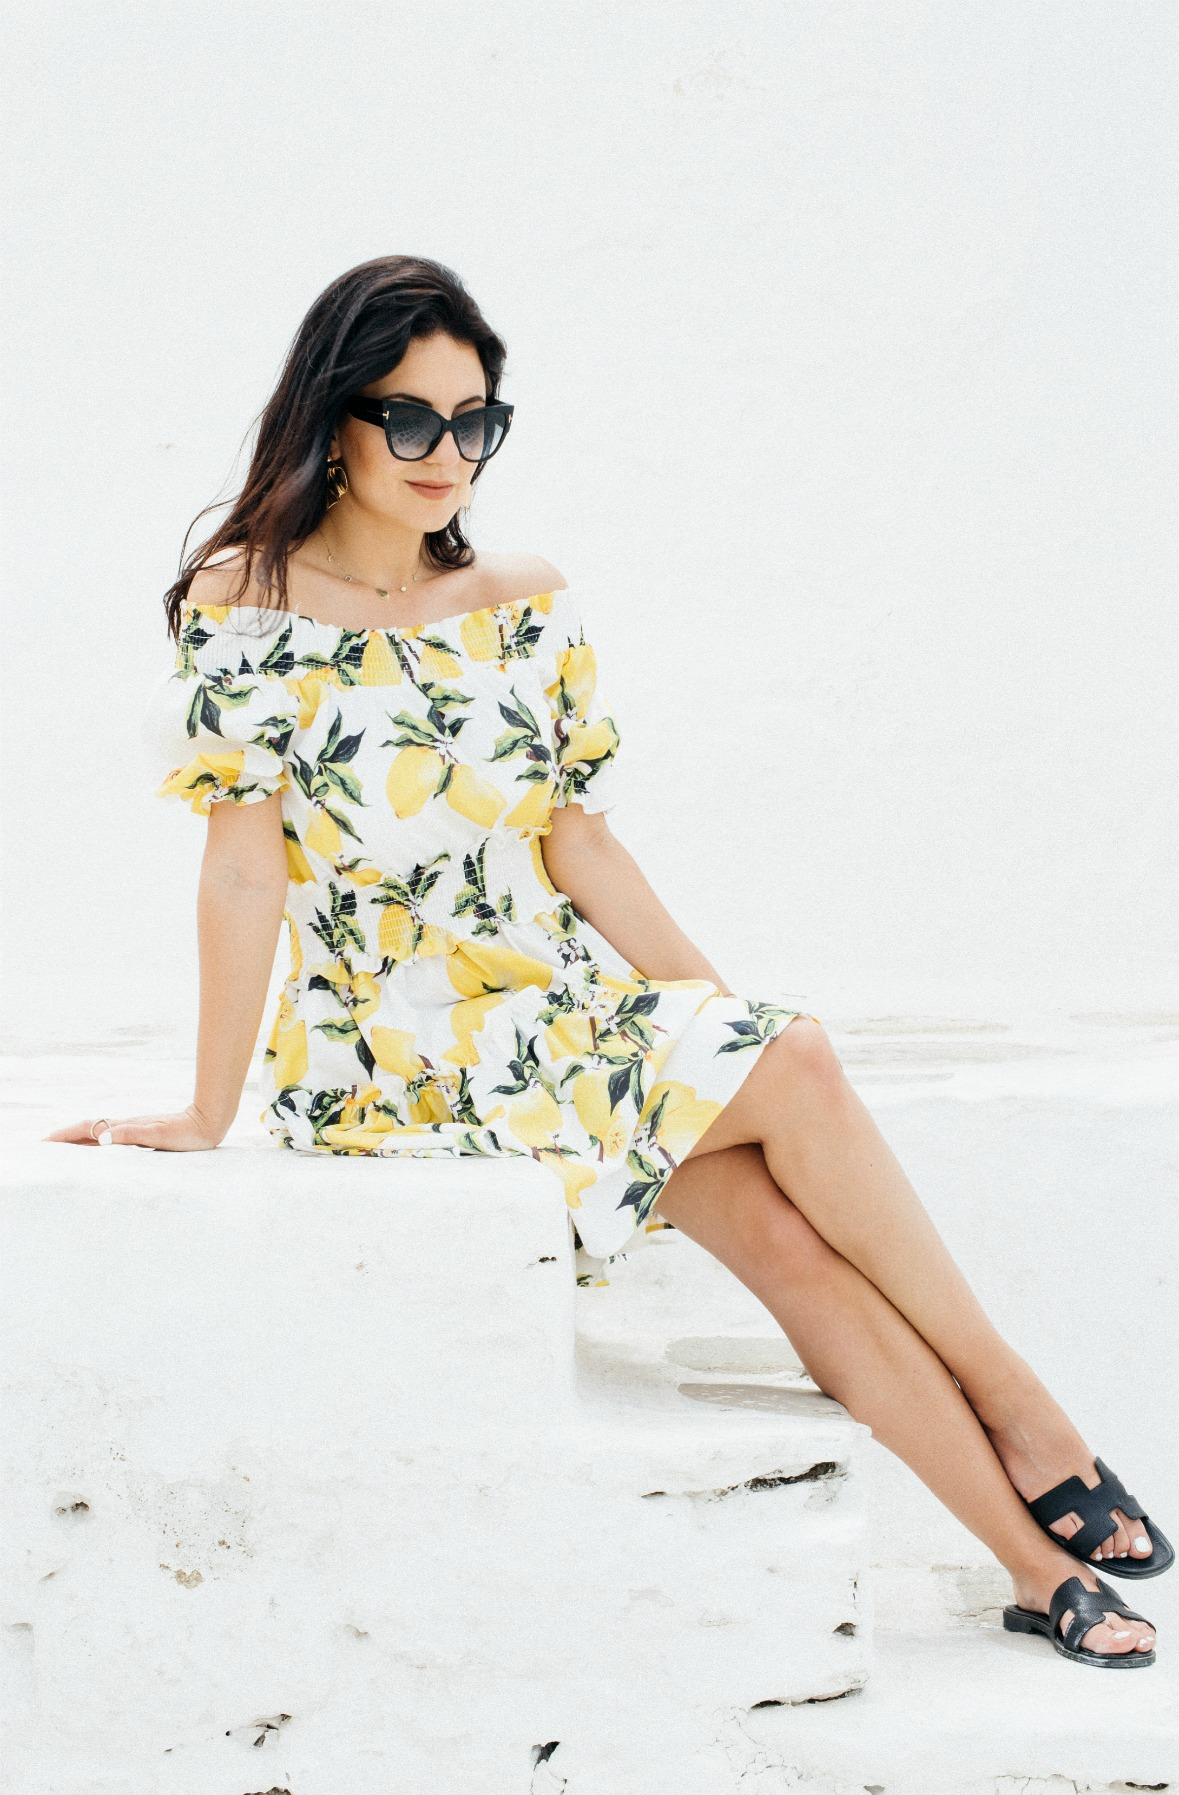 wind-mills-mykonos-town-2016-holidays-vacay-disi-couture-lemon-print-dress-30